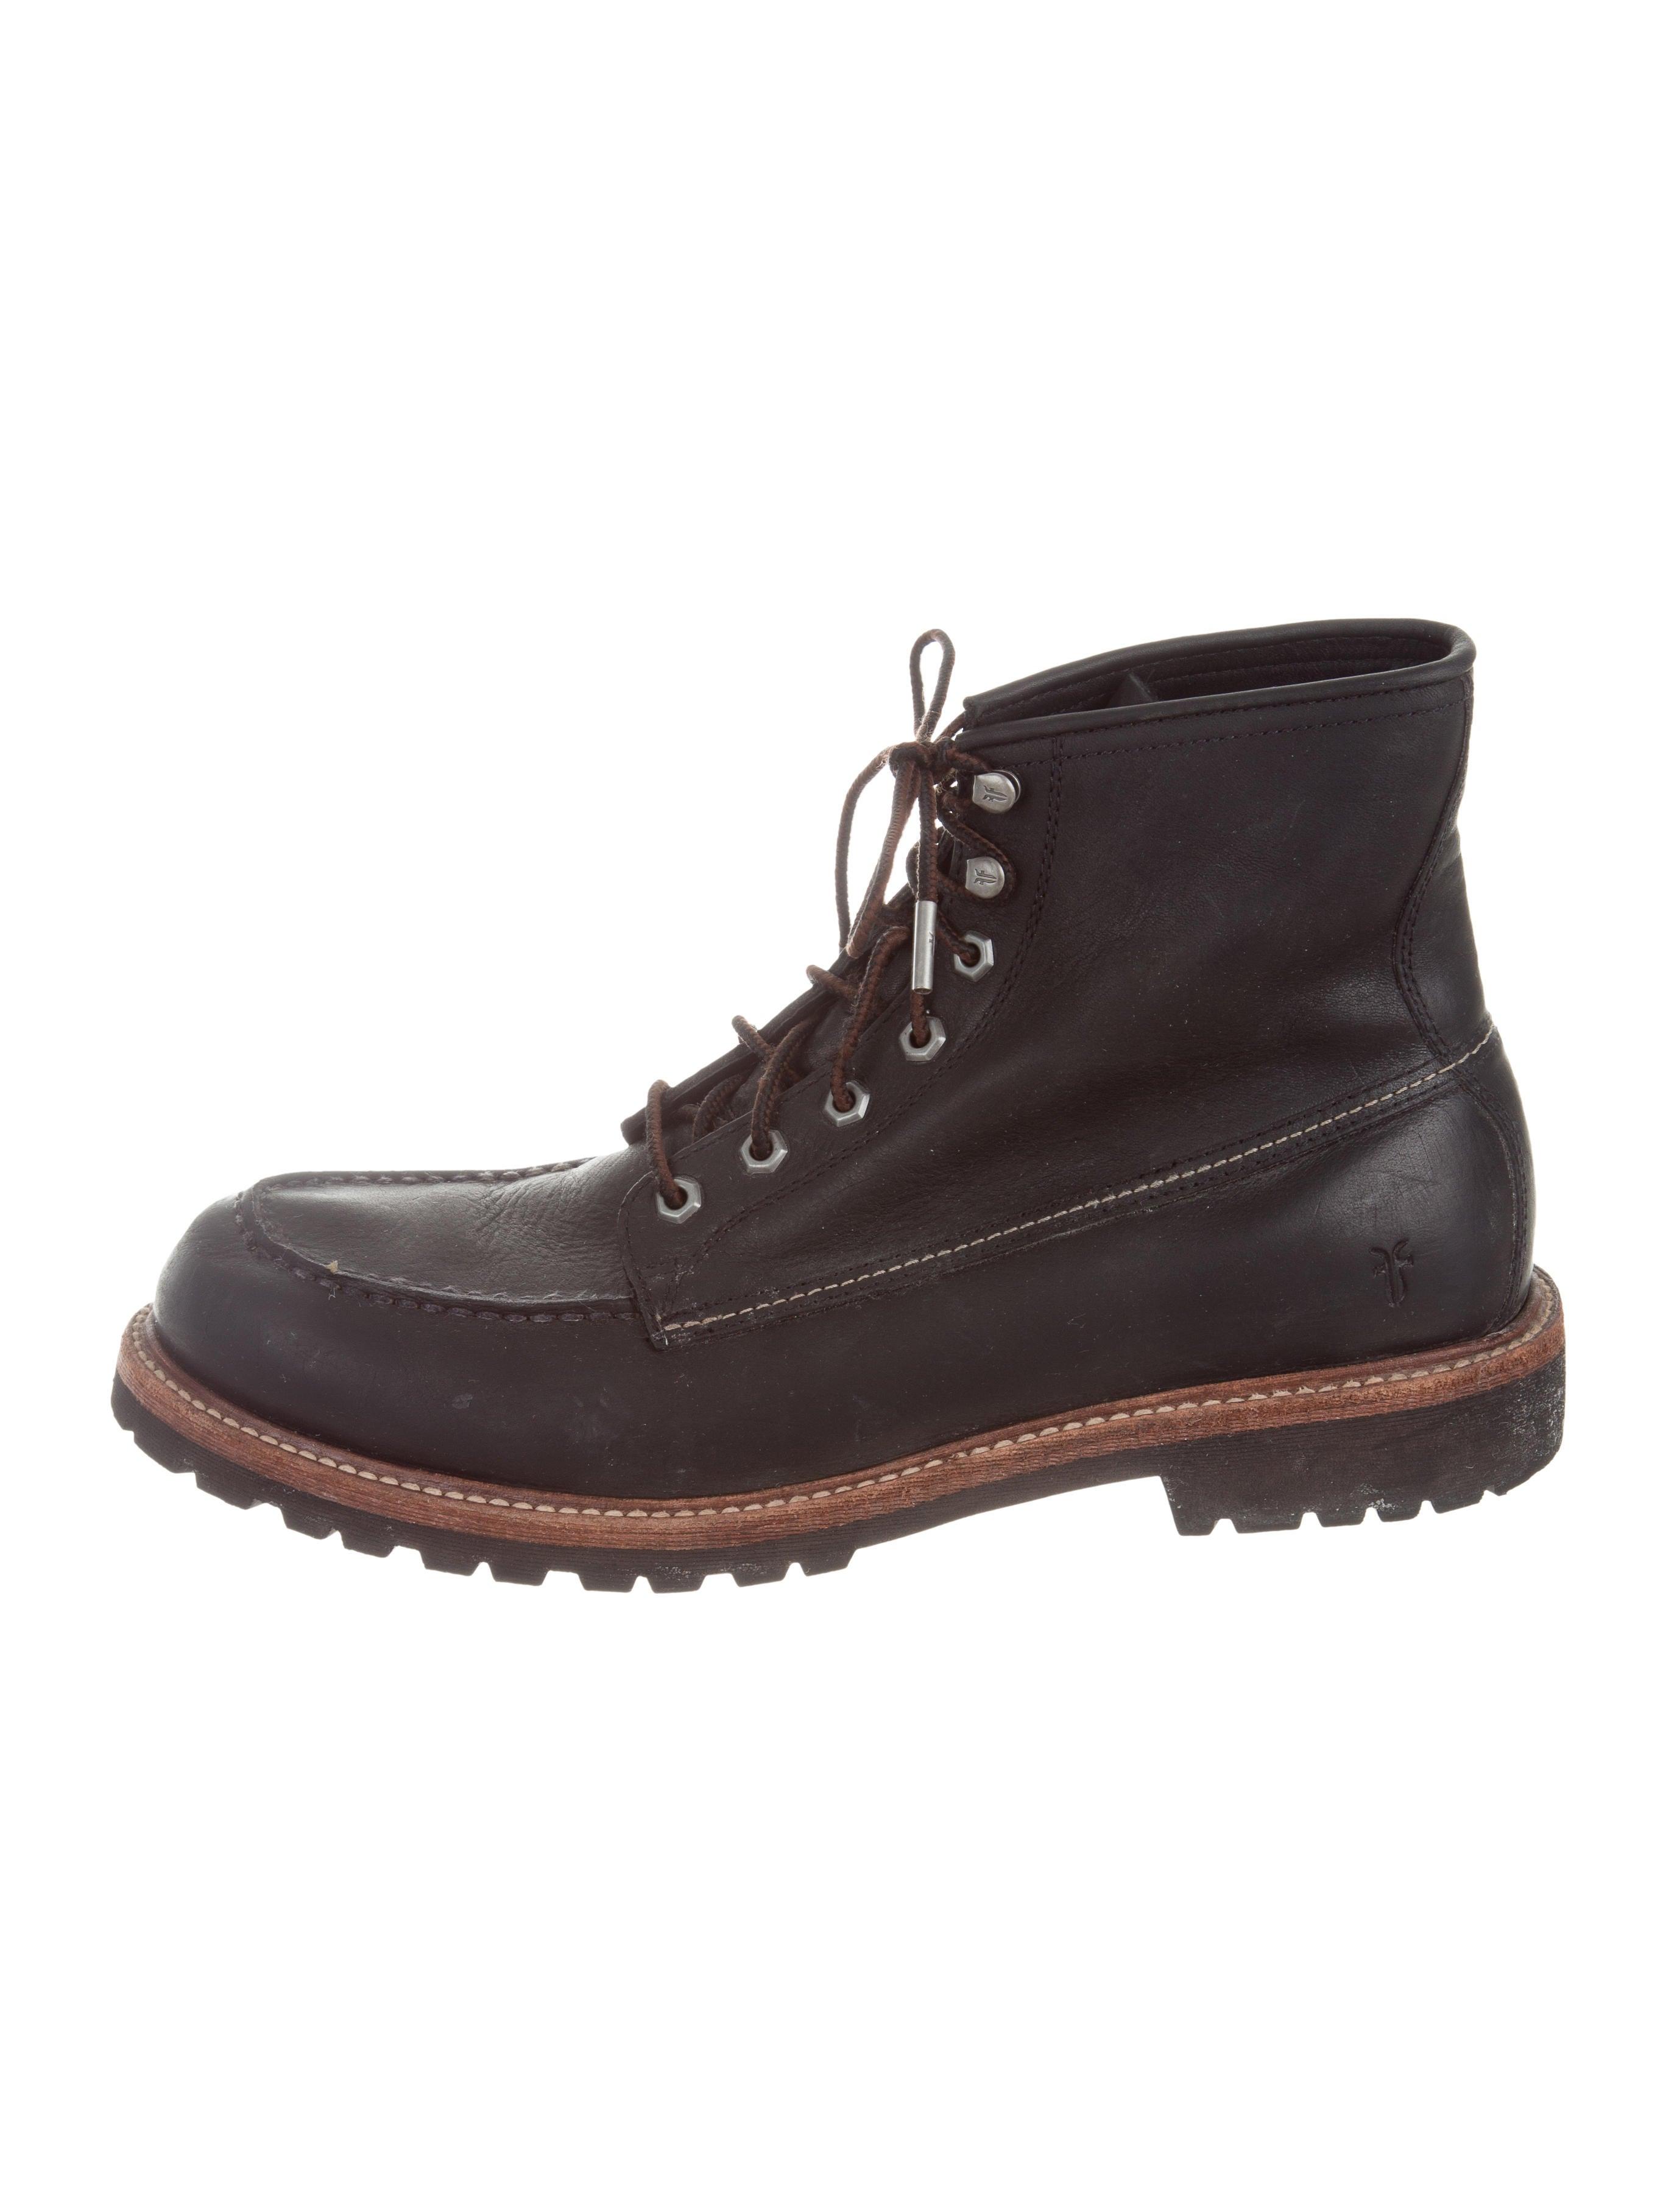 frye dakota hiking boots shoes wf821225 the realreal